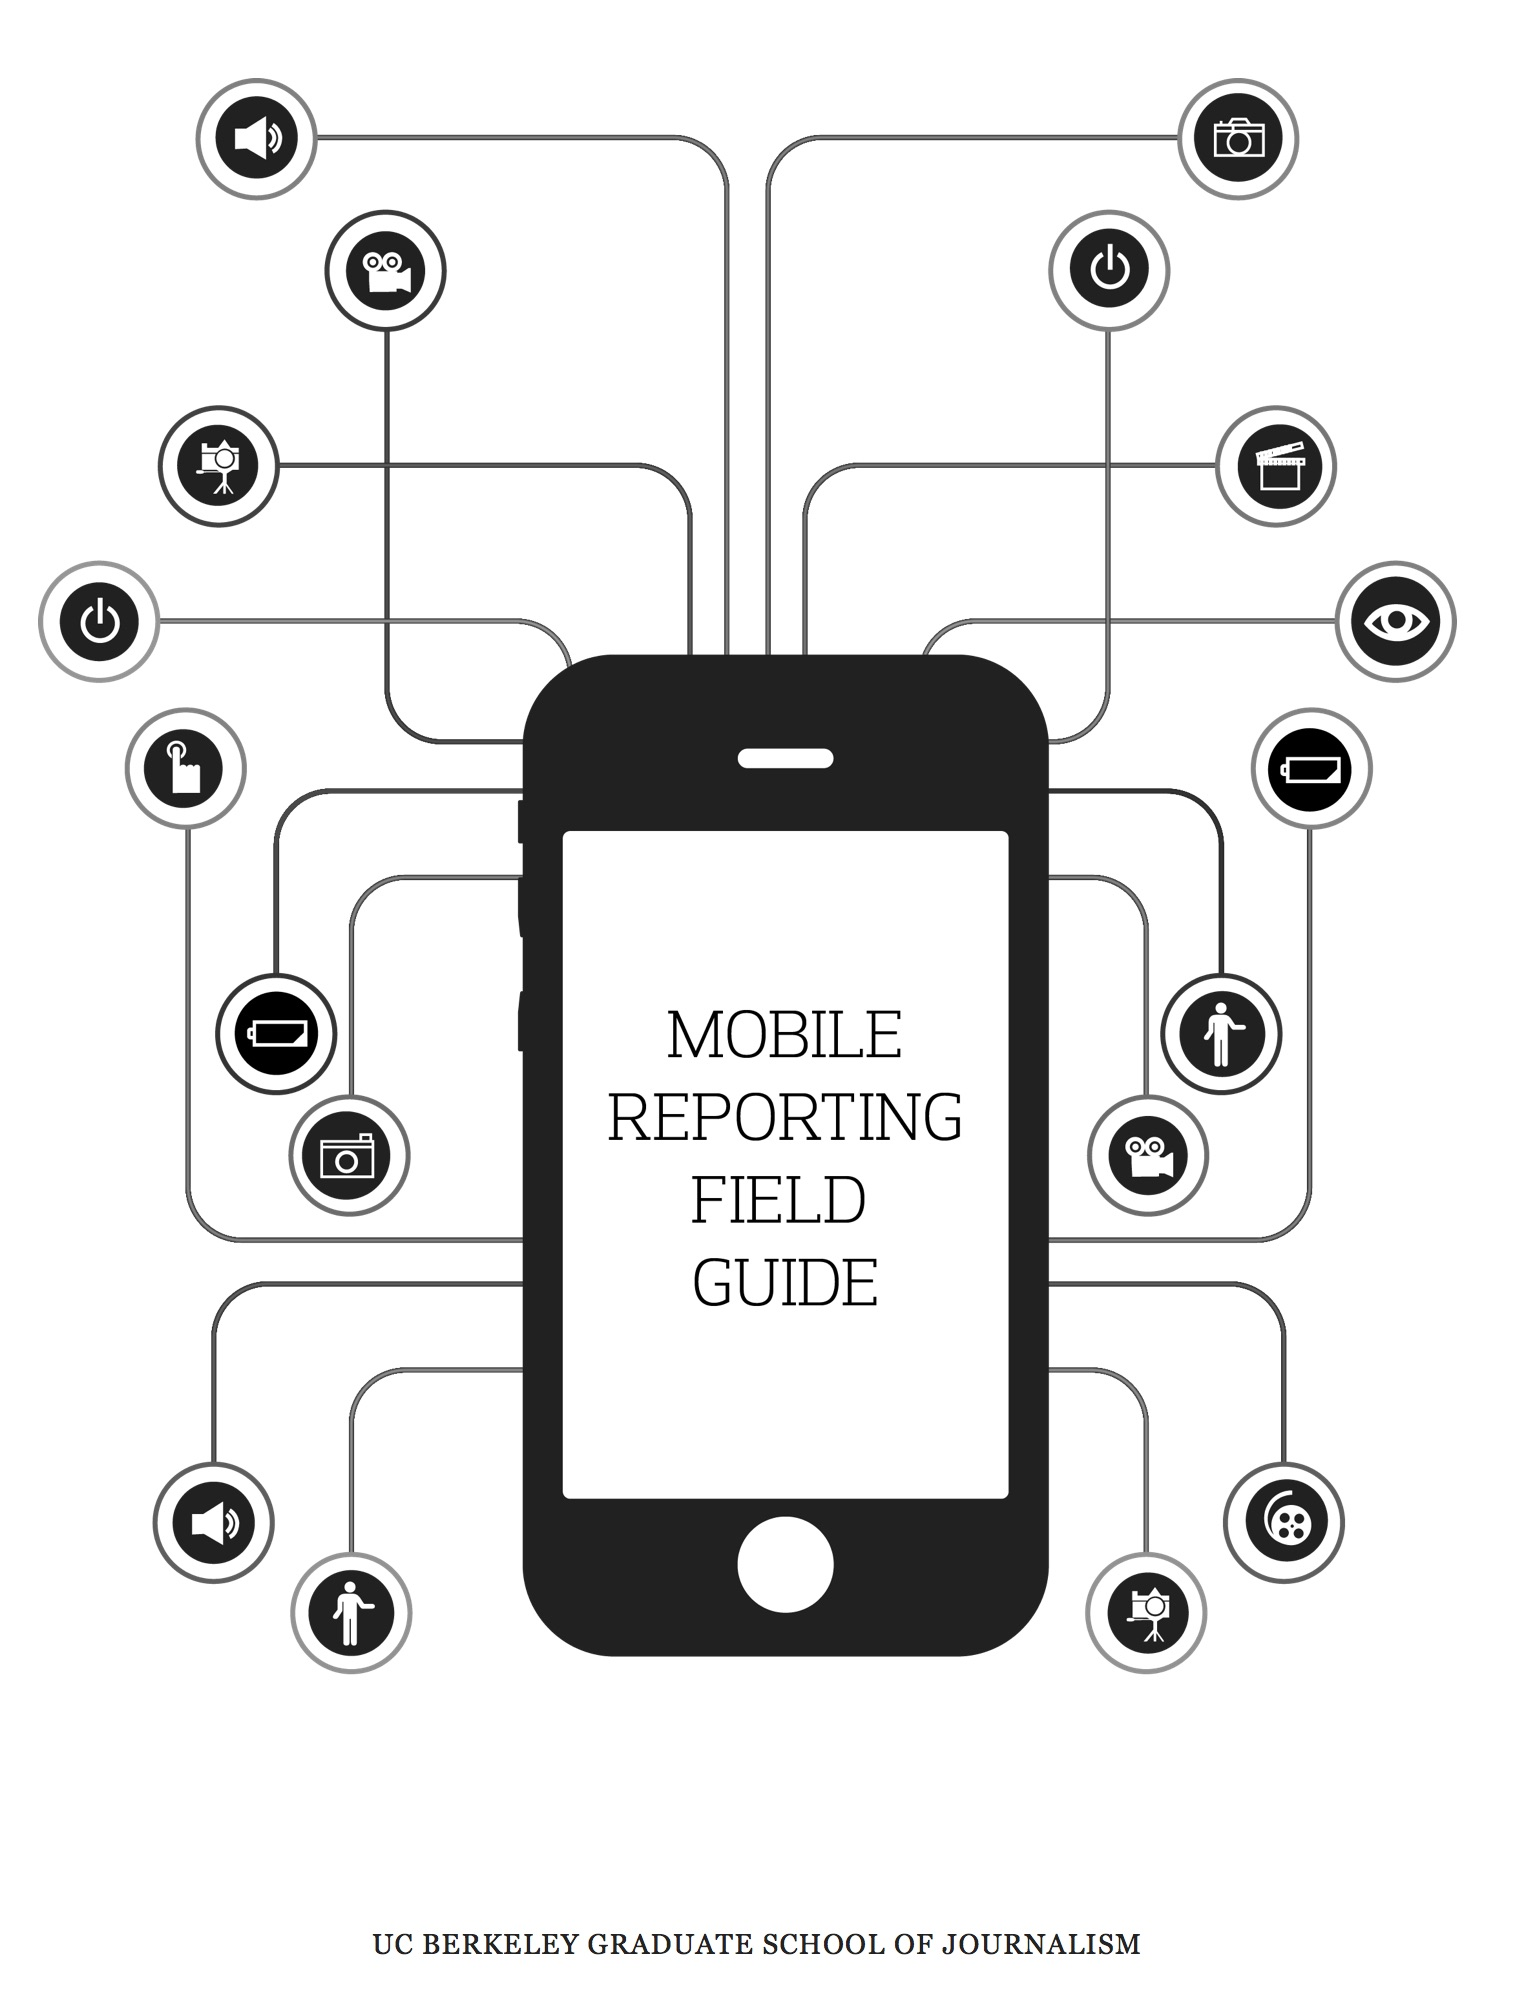 Mobile Reporting Field Guide by Richard Koci Hernandez